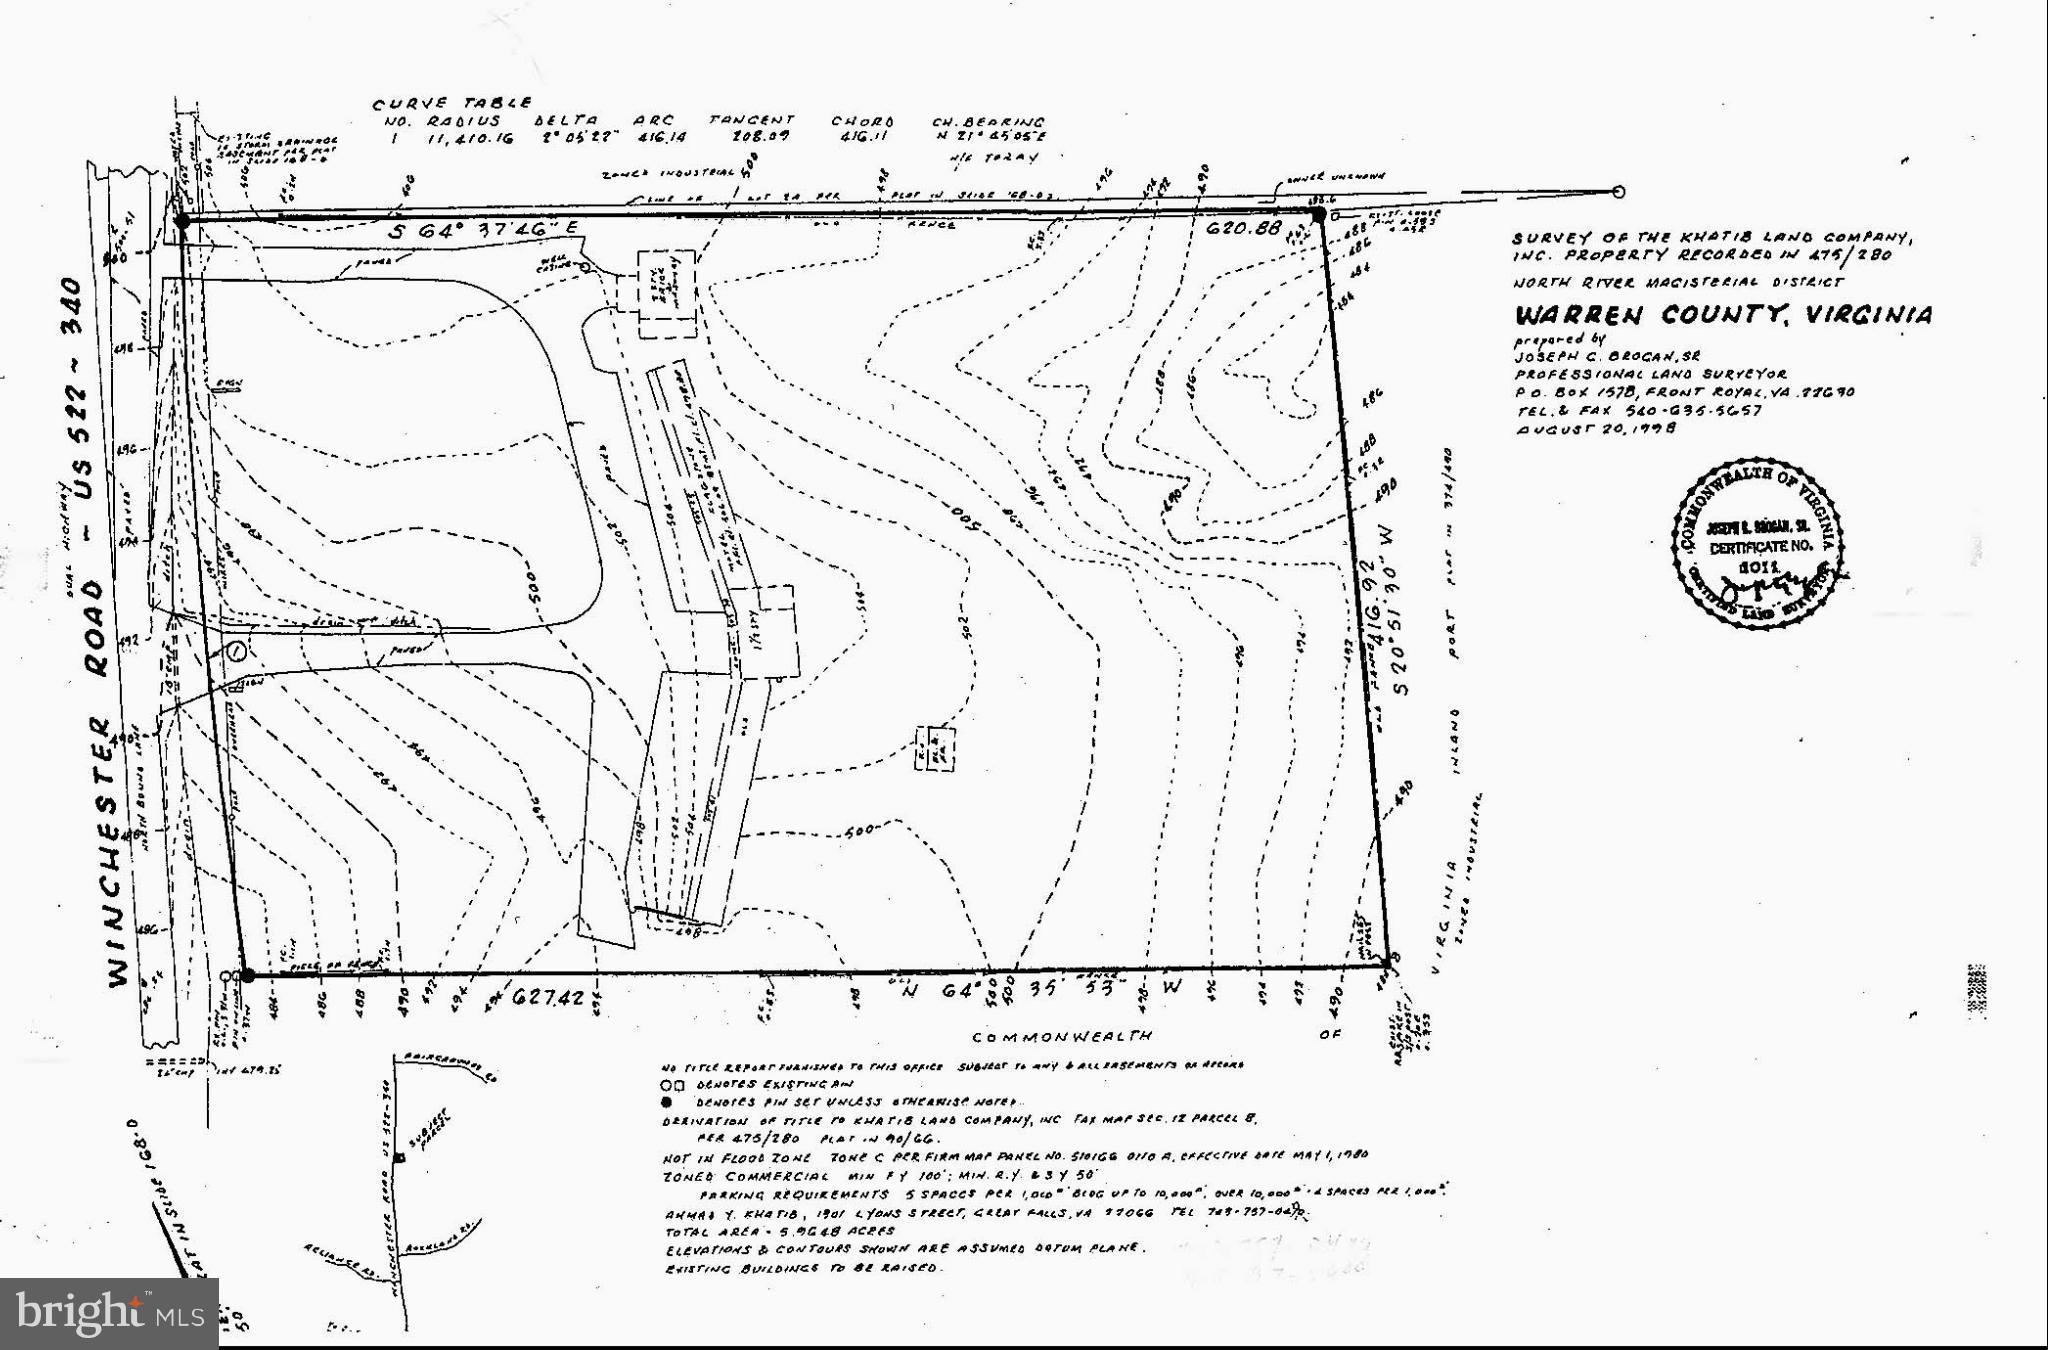 WINCHESTER ROAD, FRONT ROYAL, VA 22630